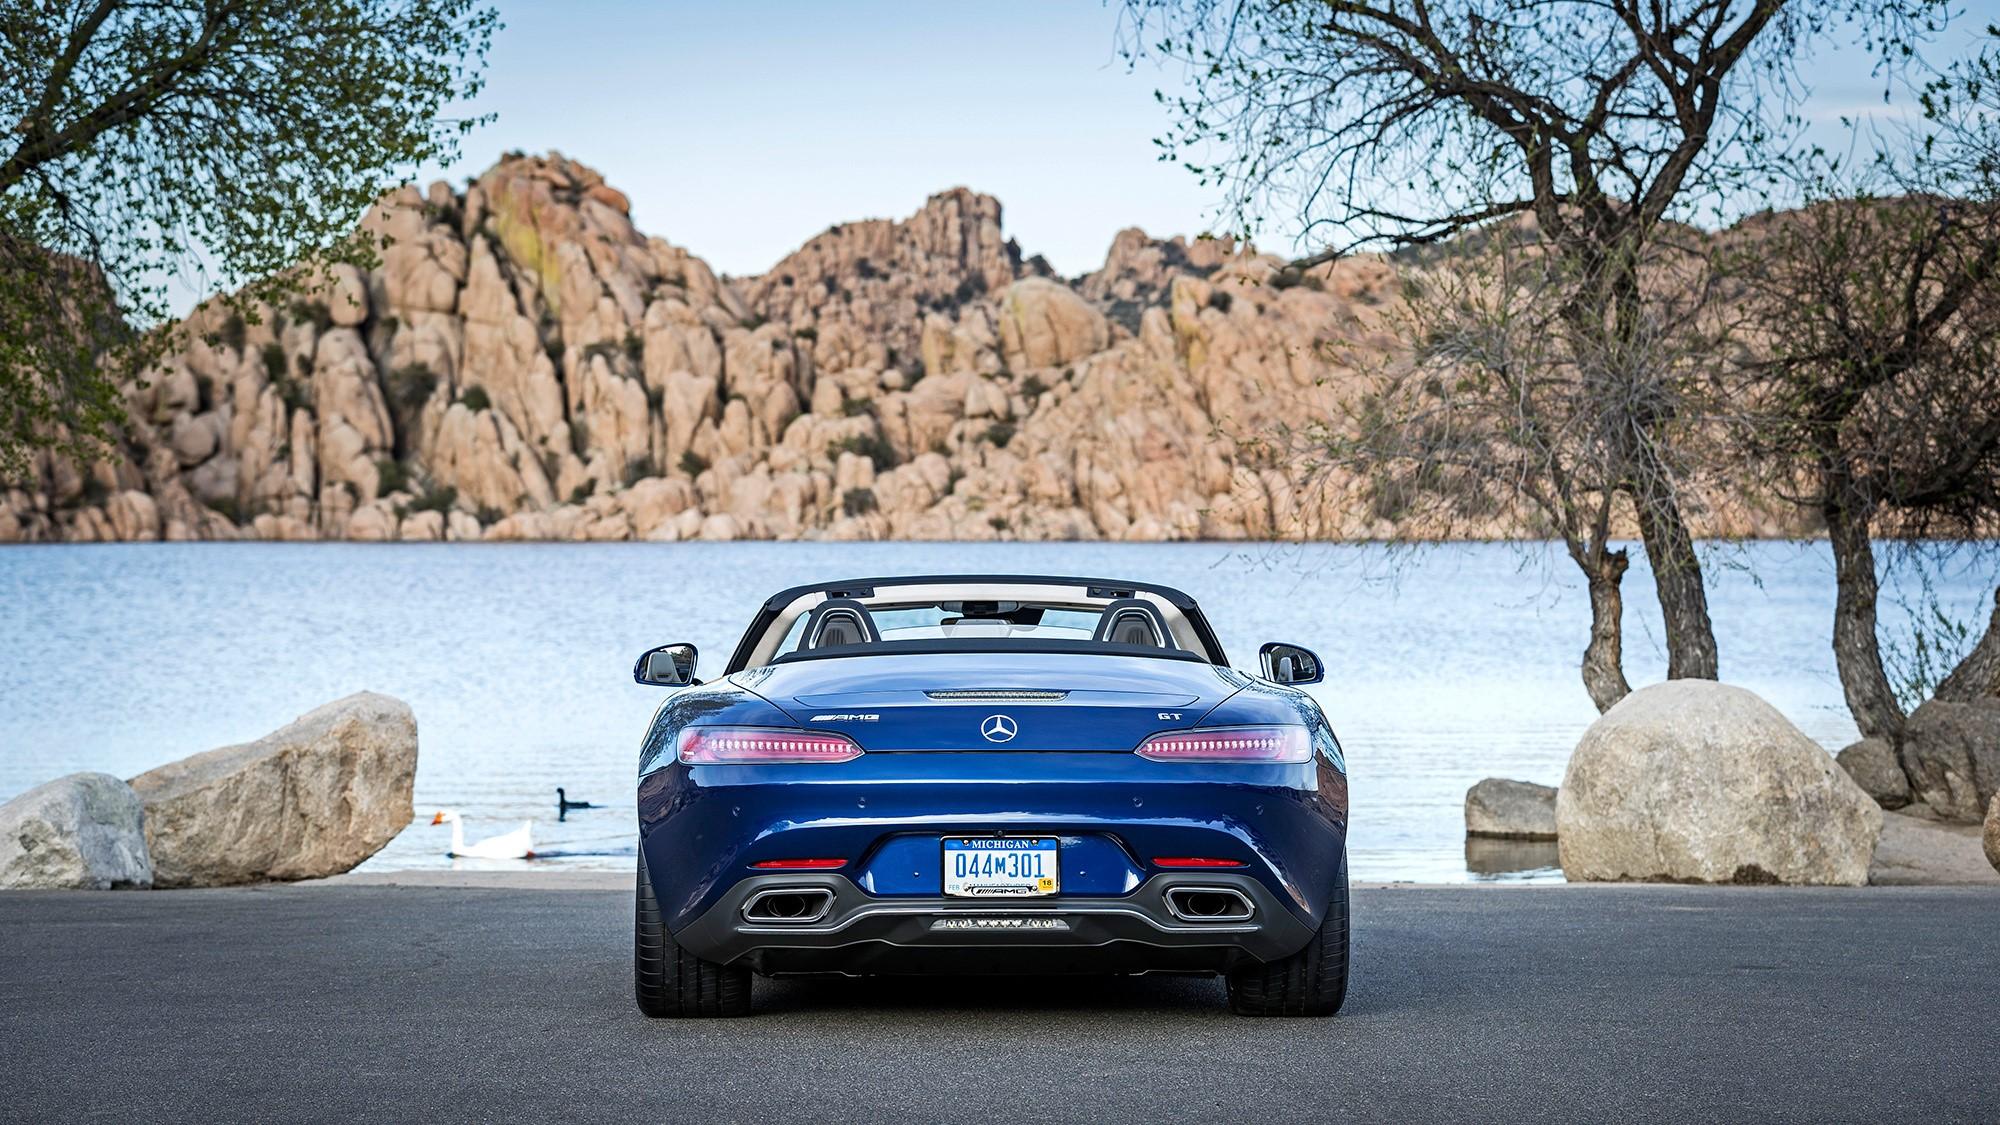 Mercedes AMG GT C Roadster Background